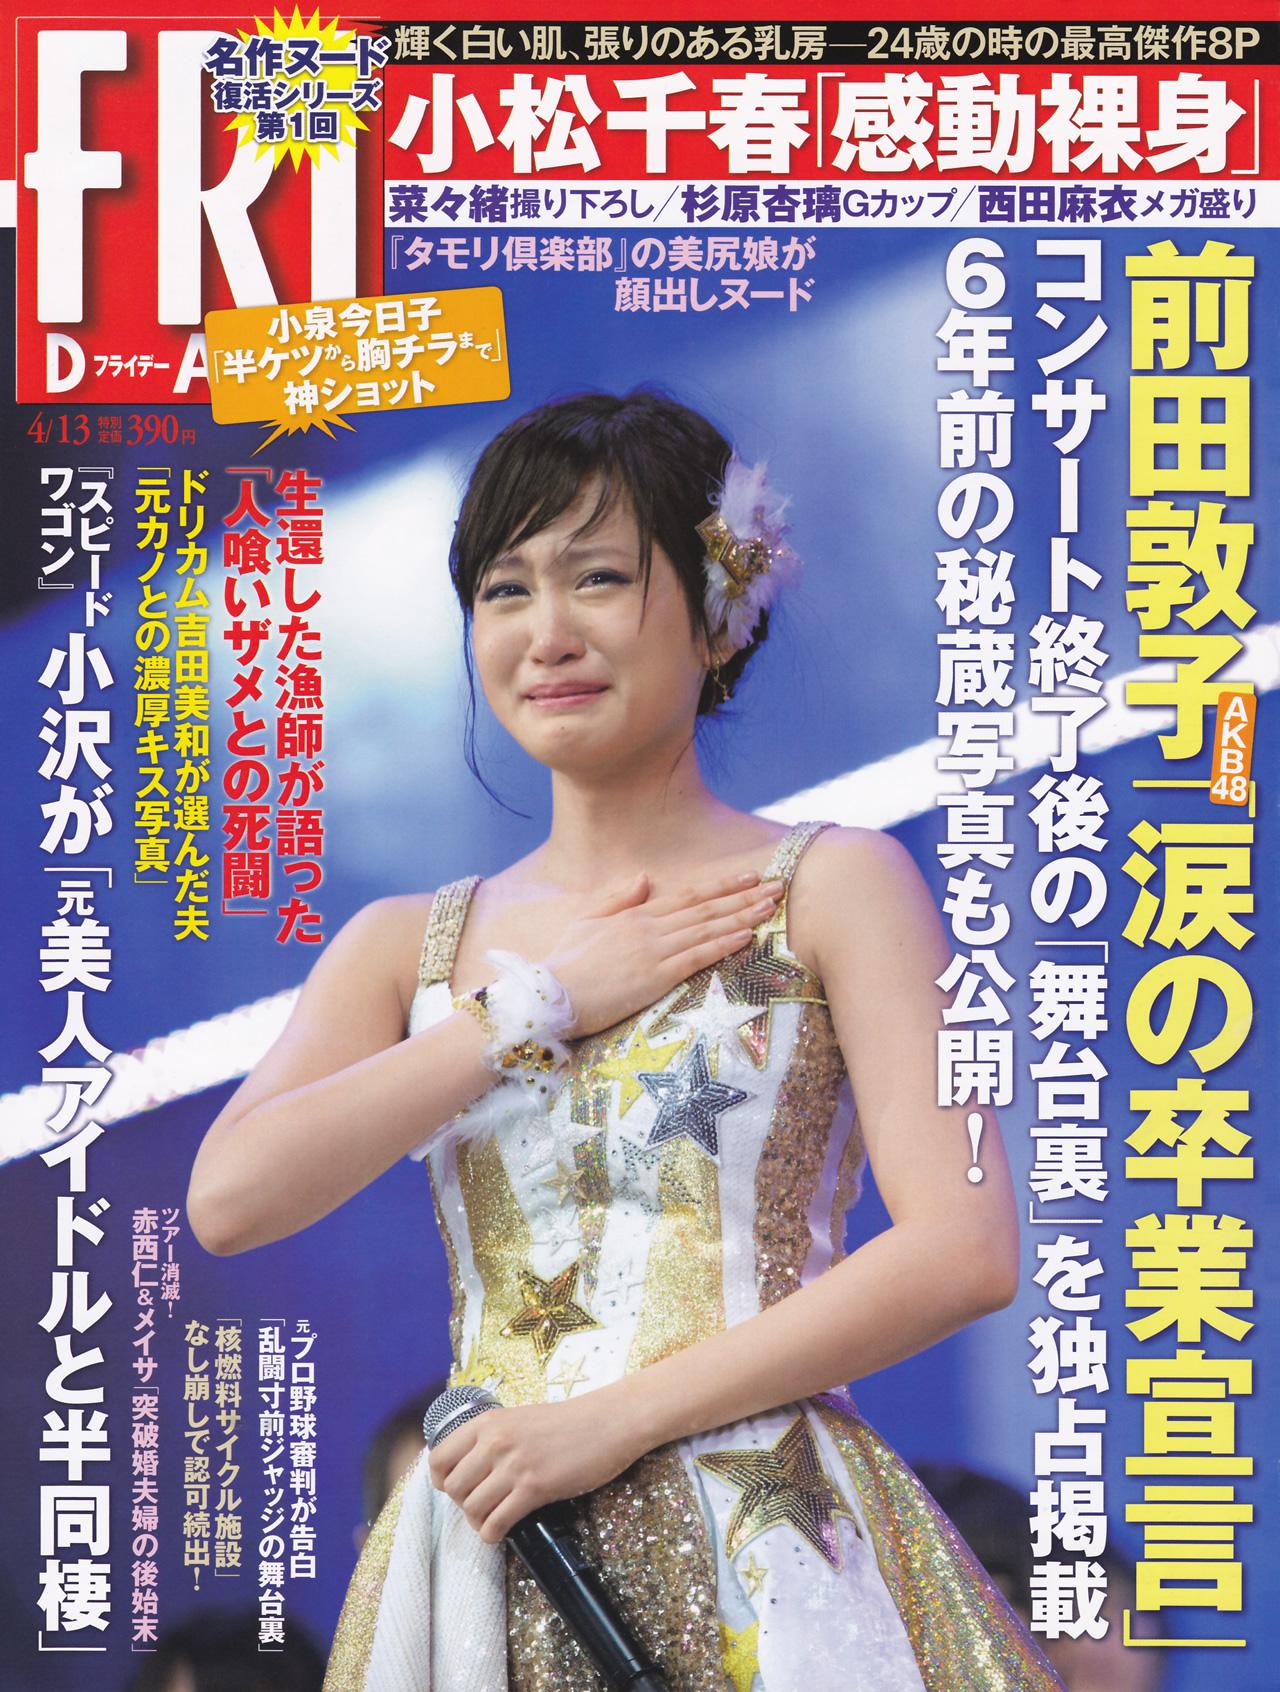 [FRIDAY] 2012.04.13 Atsuko Maeda 前田敦子 [26P16MB]